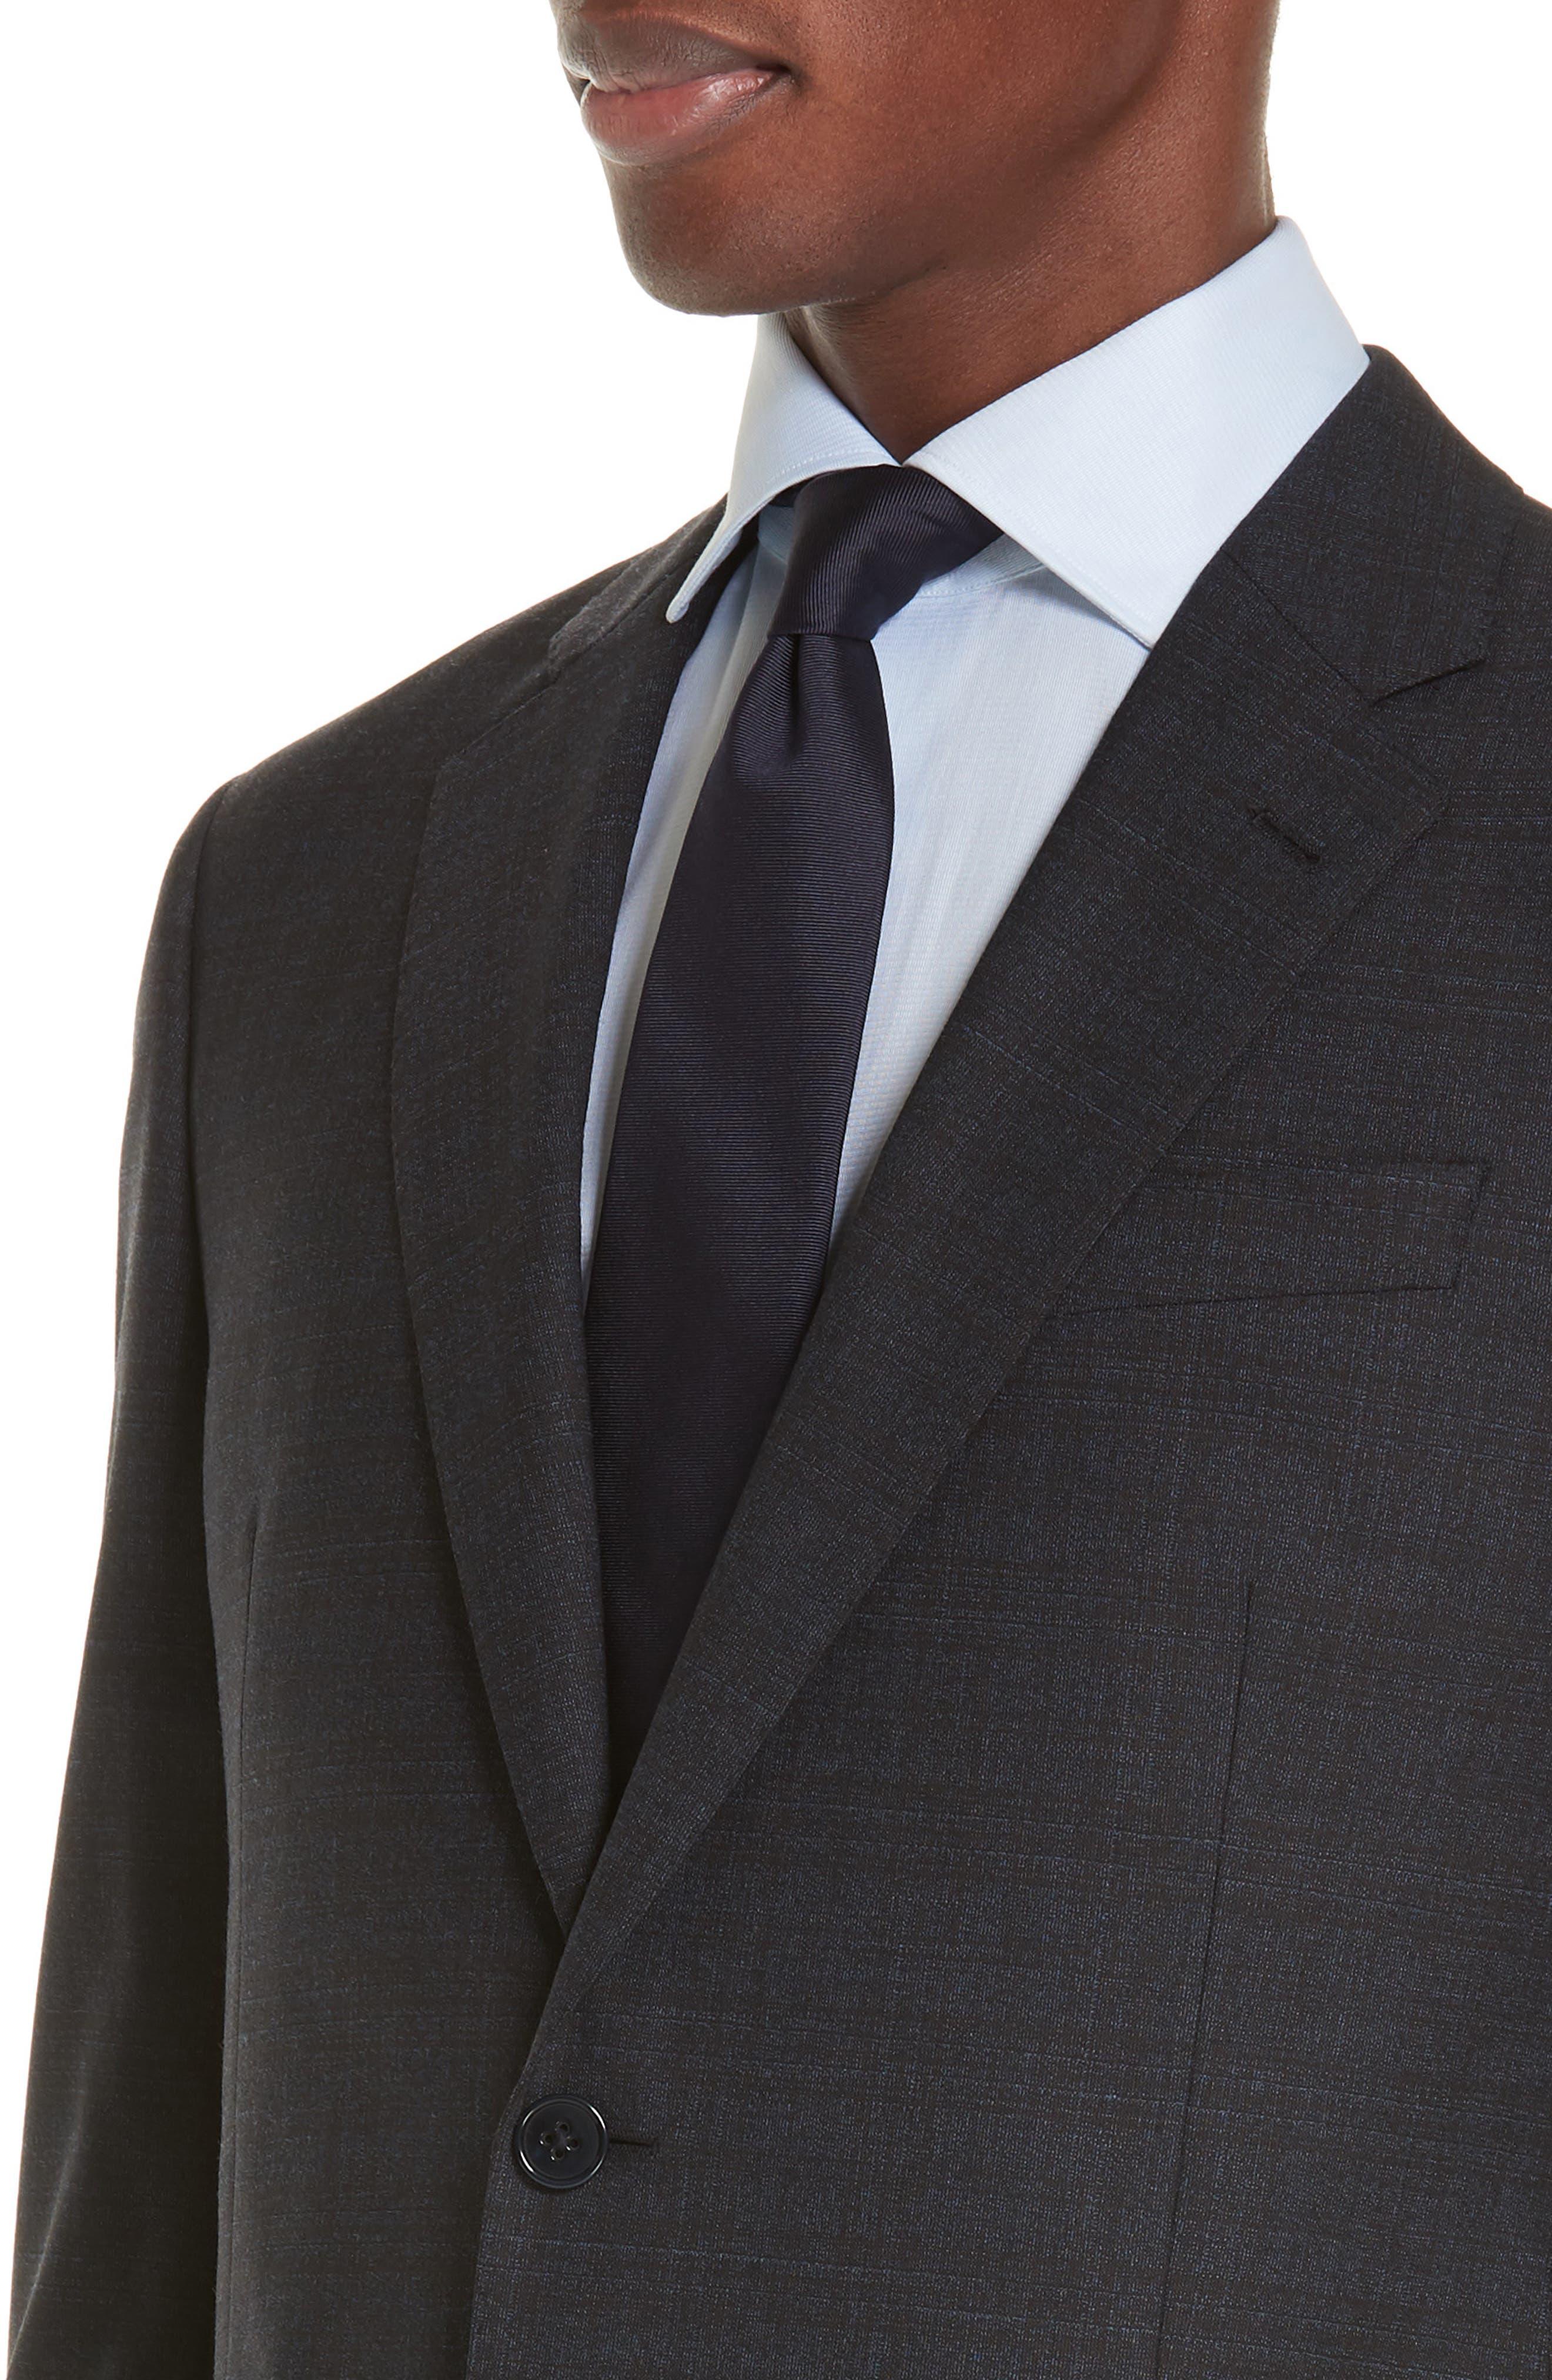 G-Line Trim Fit Stretch Plaid Wool Suit,                             Alternate thumbnail 4, color,                             NAVY/ BROWN